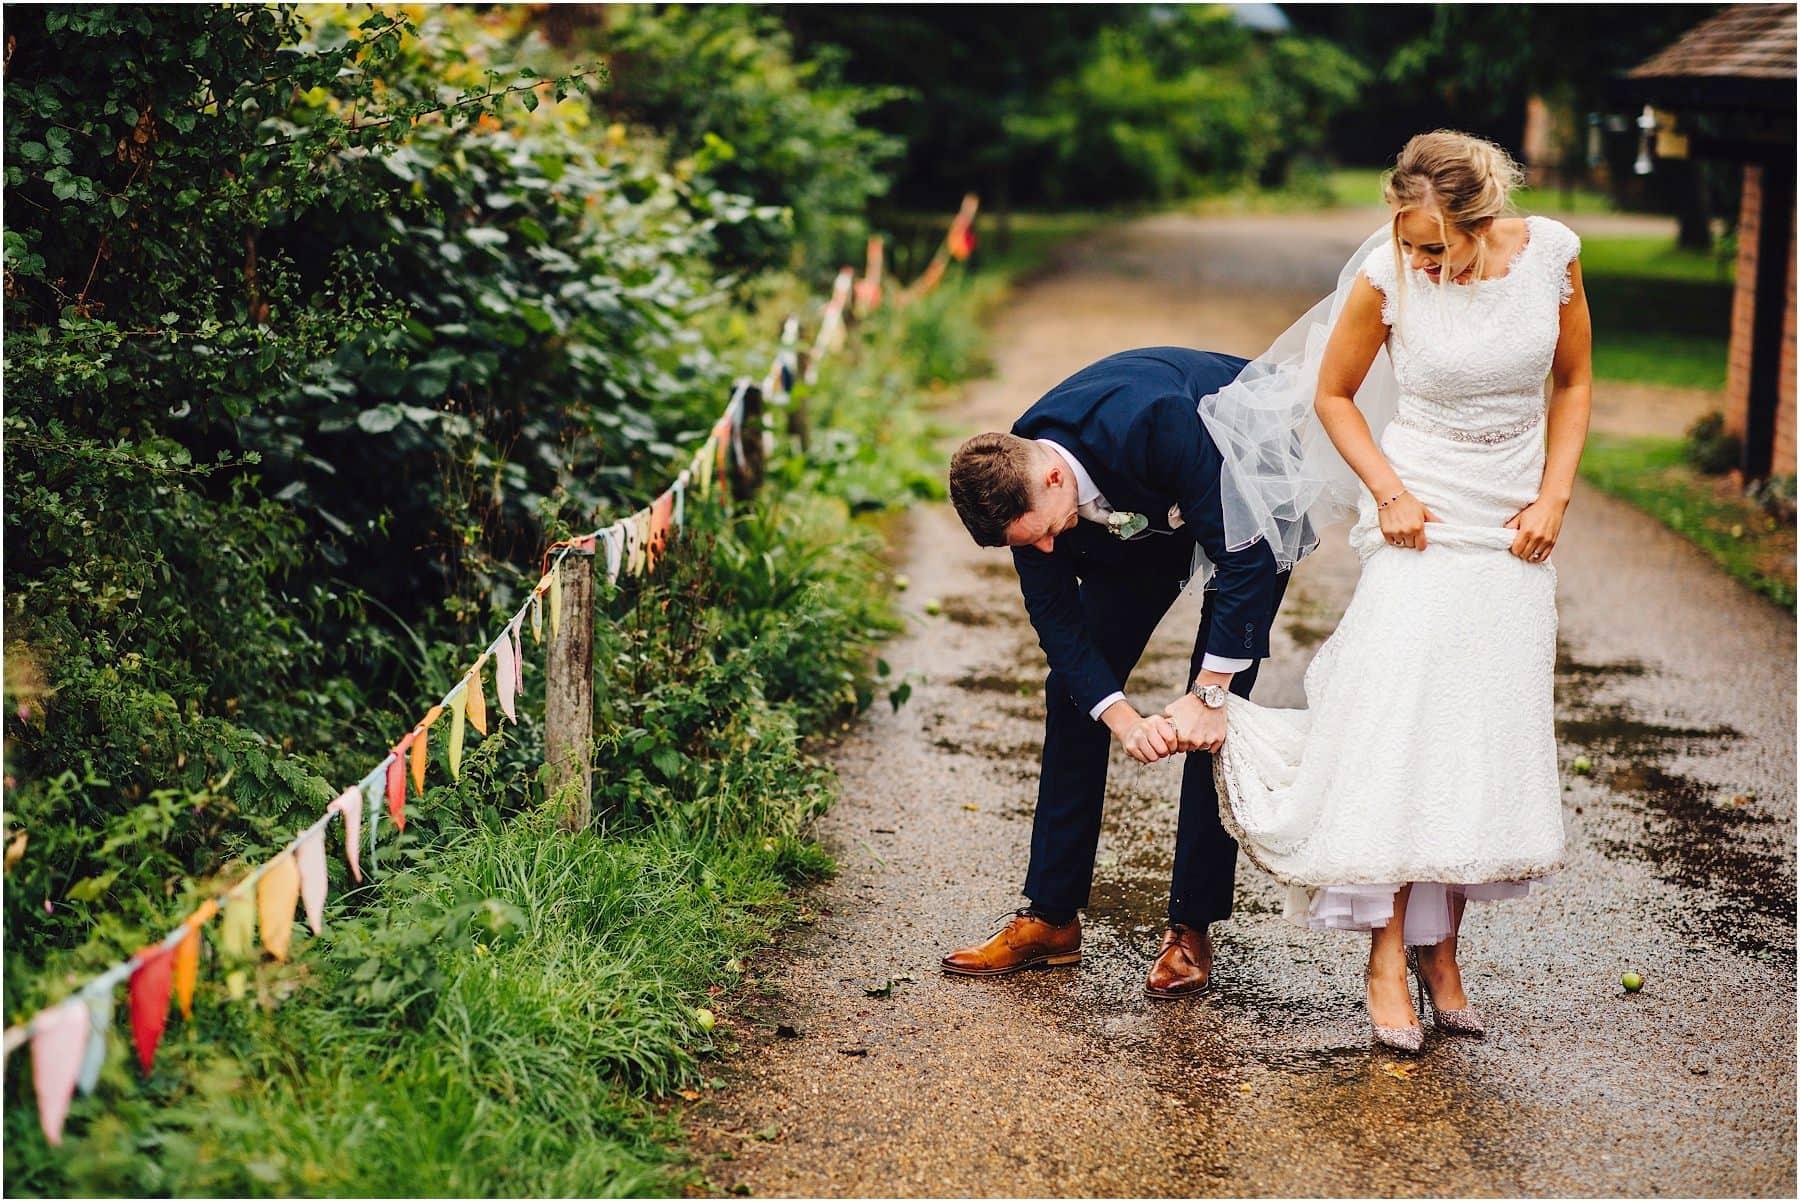 groom rearranging brides dress